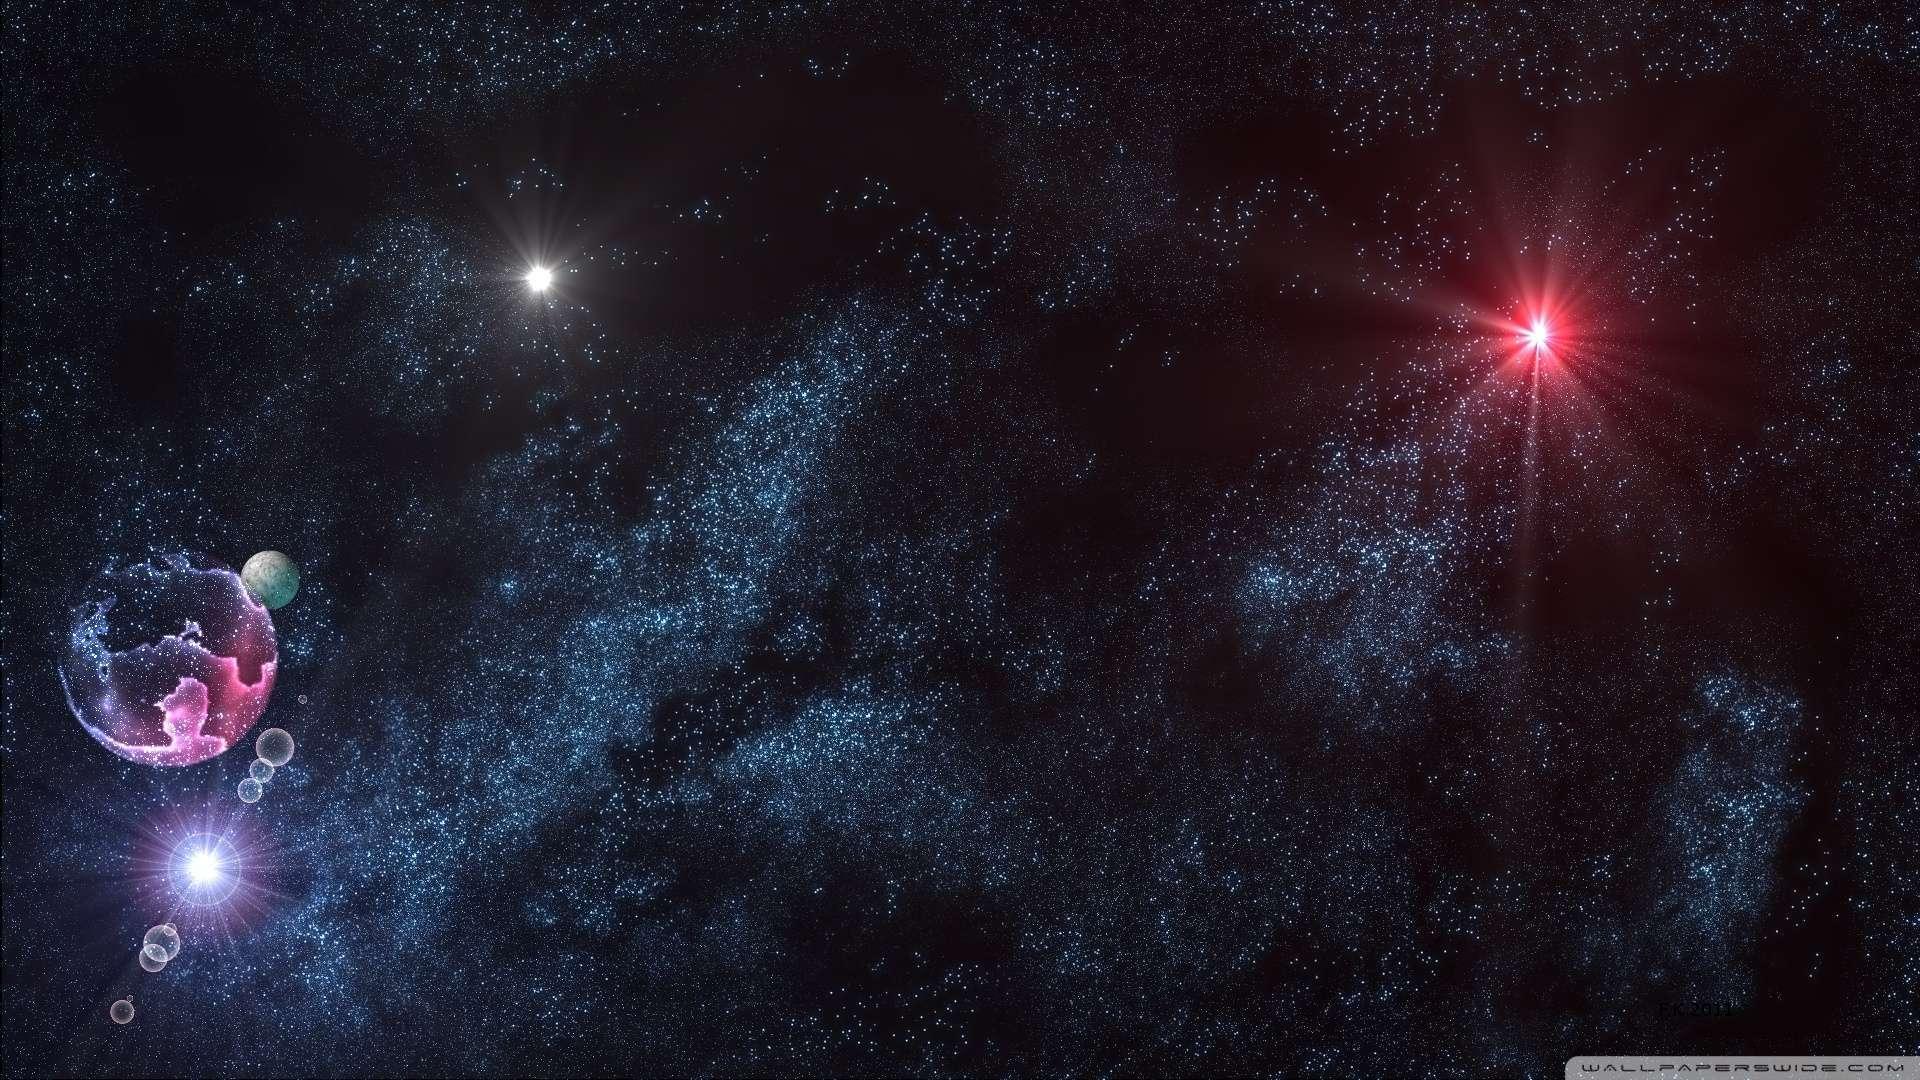 Galaxy 1080p Wallpaper - WallpaperSafari